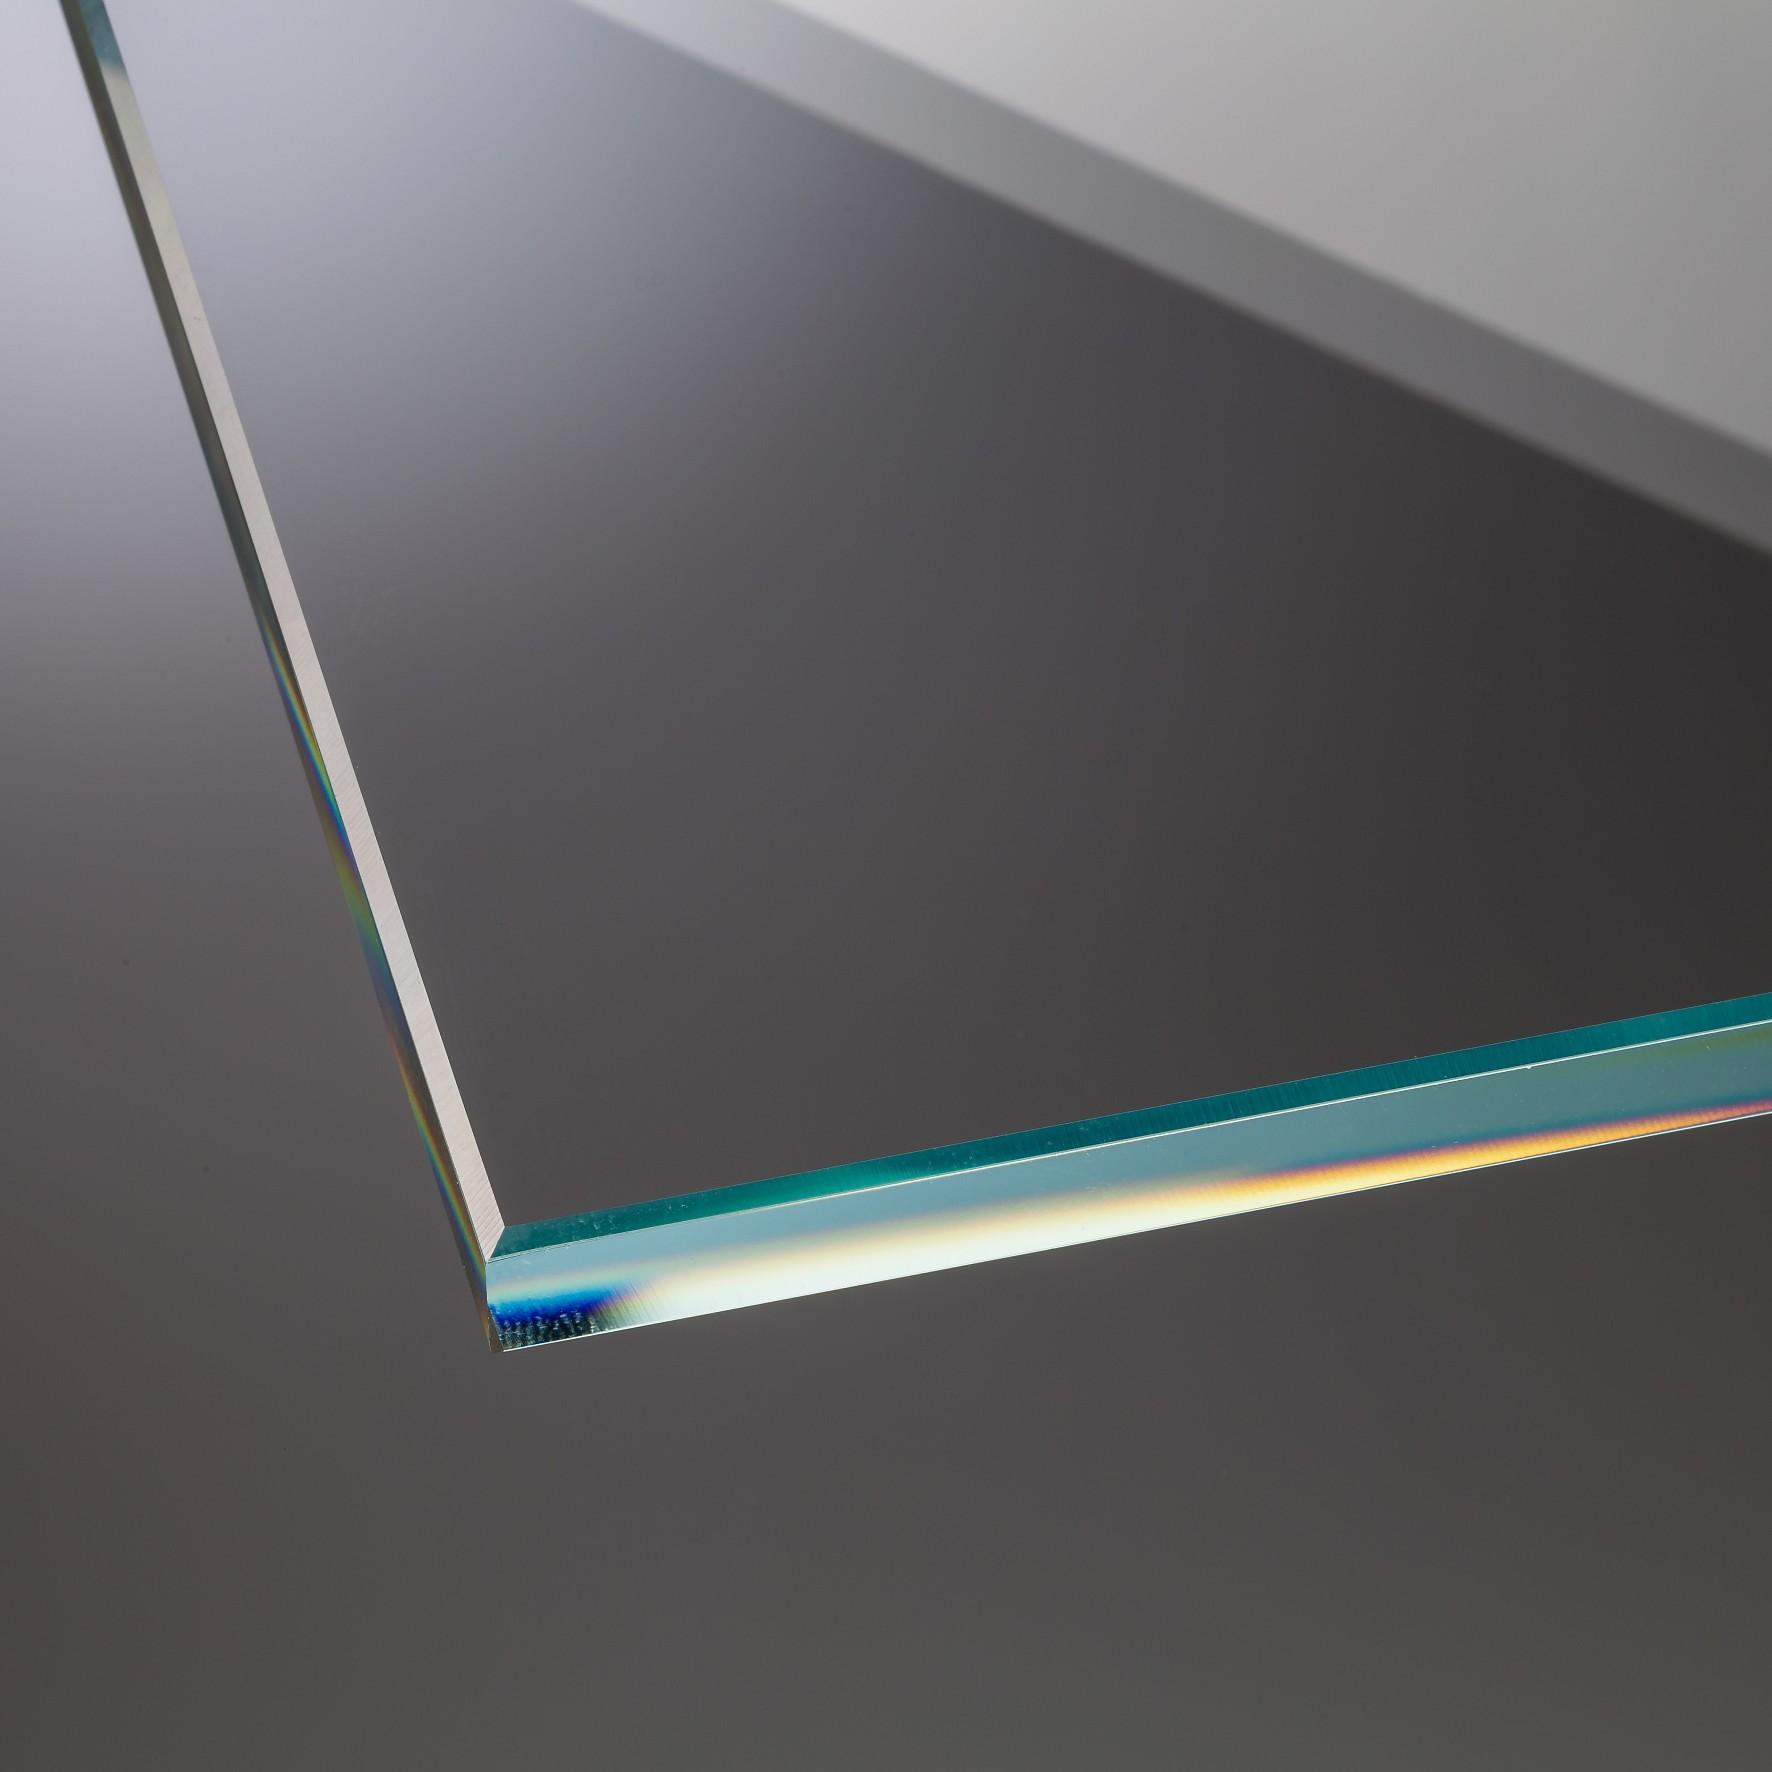 8 mm wei glas wei glas floatglas glas nach ma glasheld. Black Bedroom Furniture Sets. Home Design Ideas